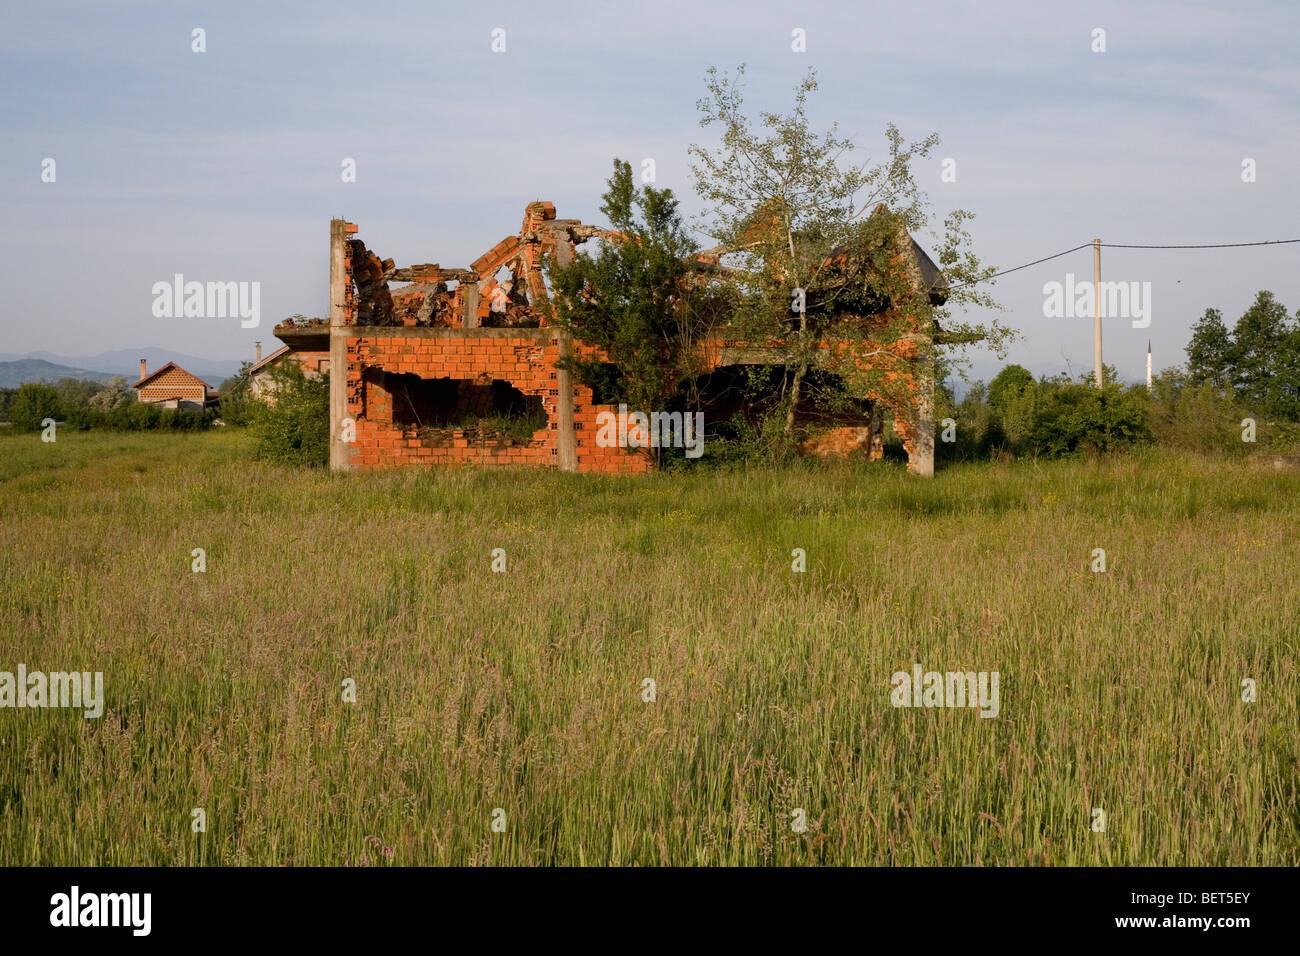 A war damaged Muslim building in the village of Kevljani, northwest Bosnia and Herzegovina. Stock Photo